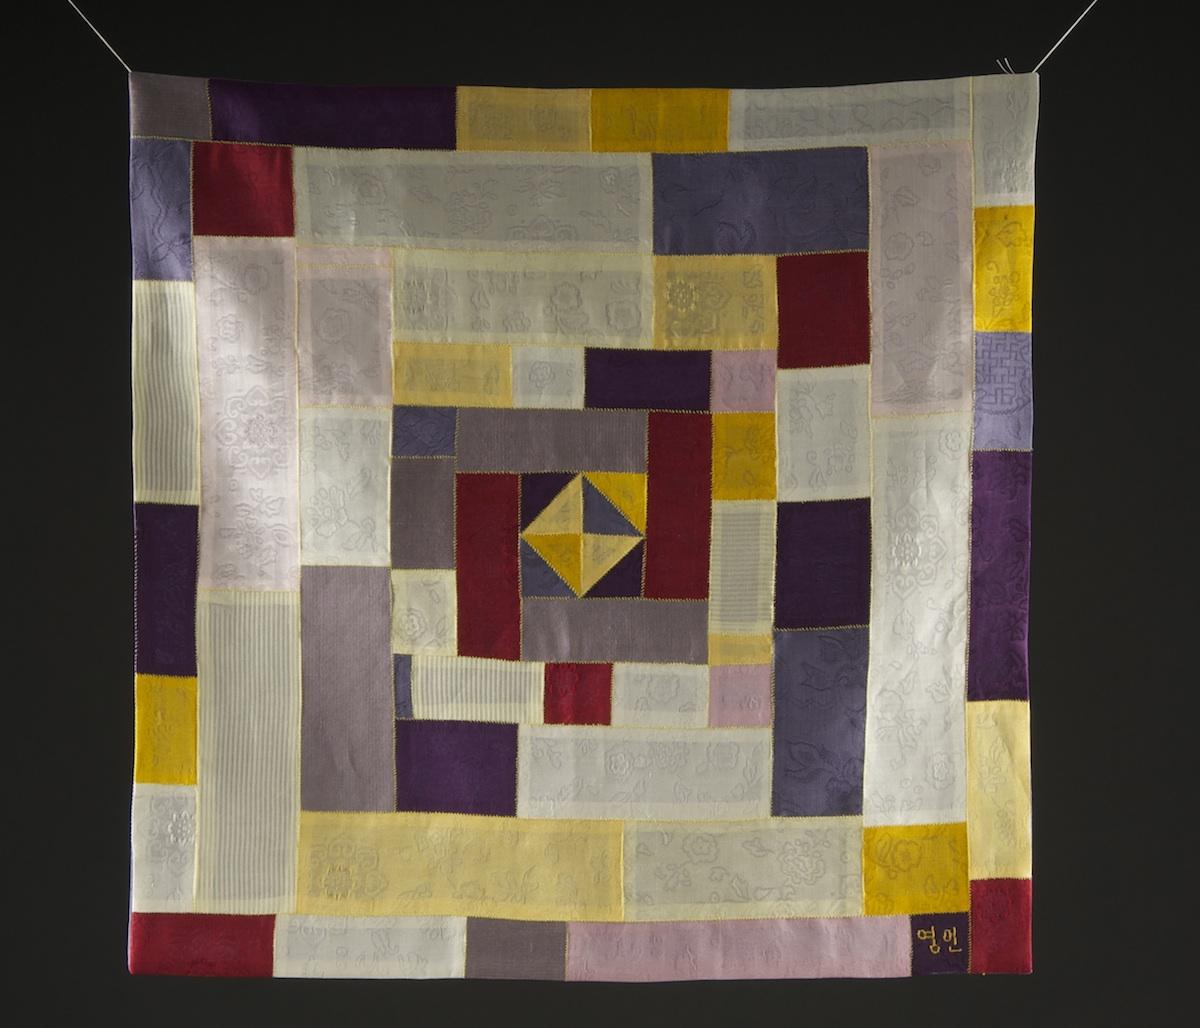 D4d13c7314eff3.purple bojagi large.jpg